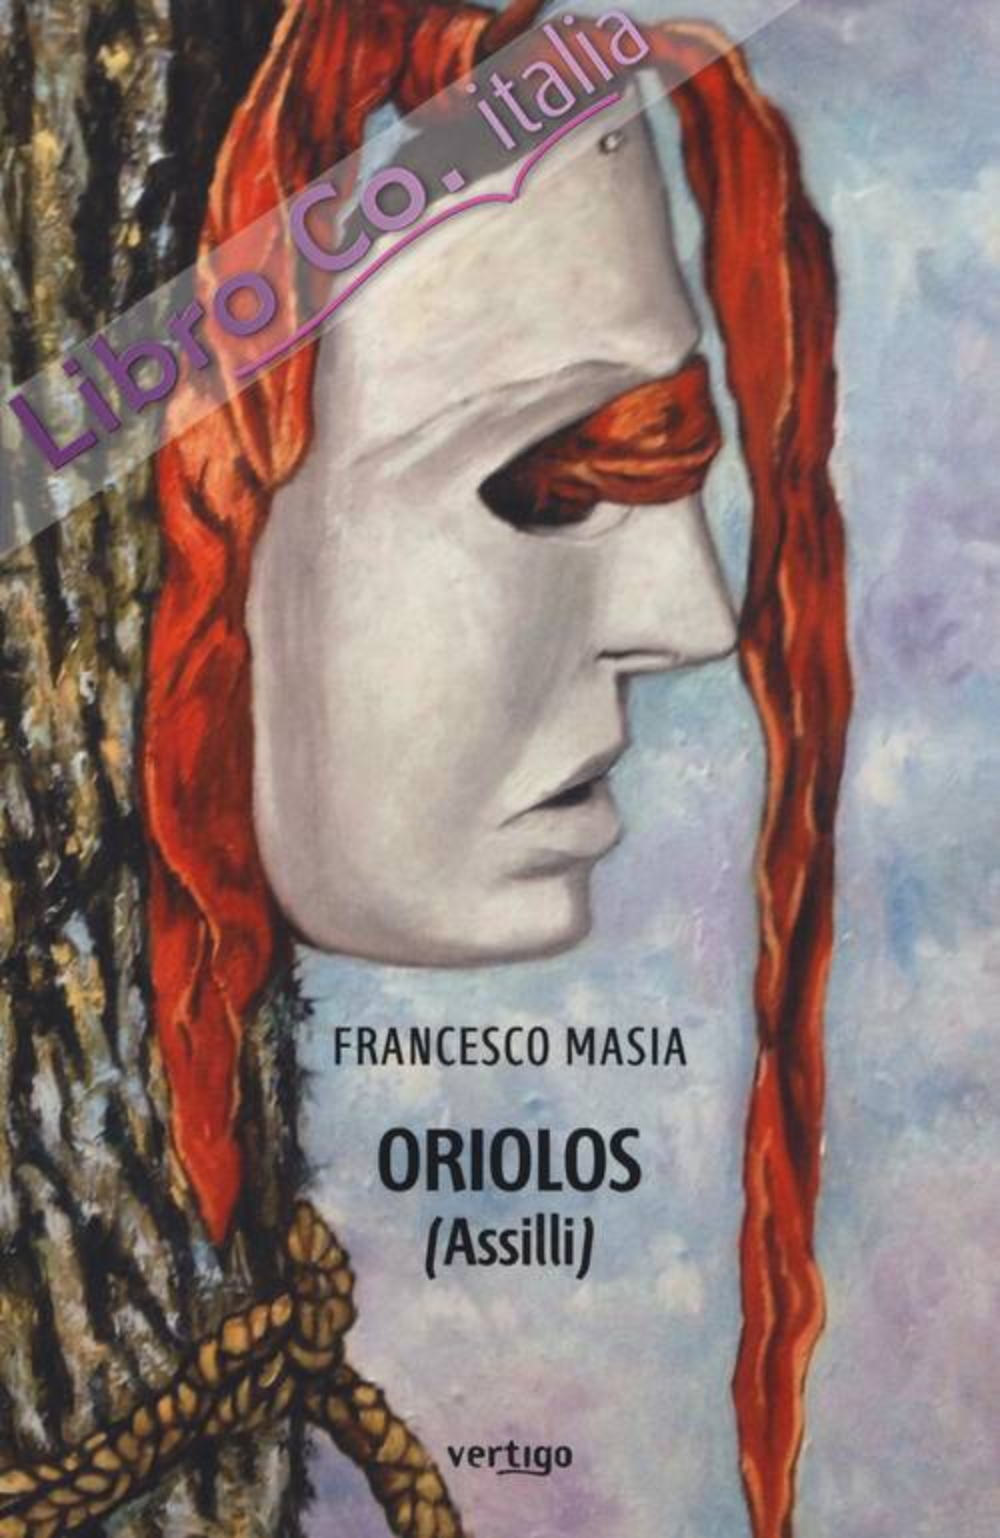 Oriolos (Assilli)